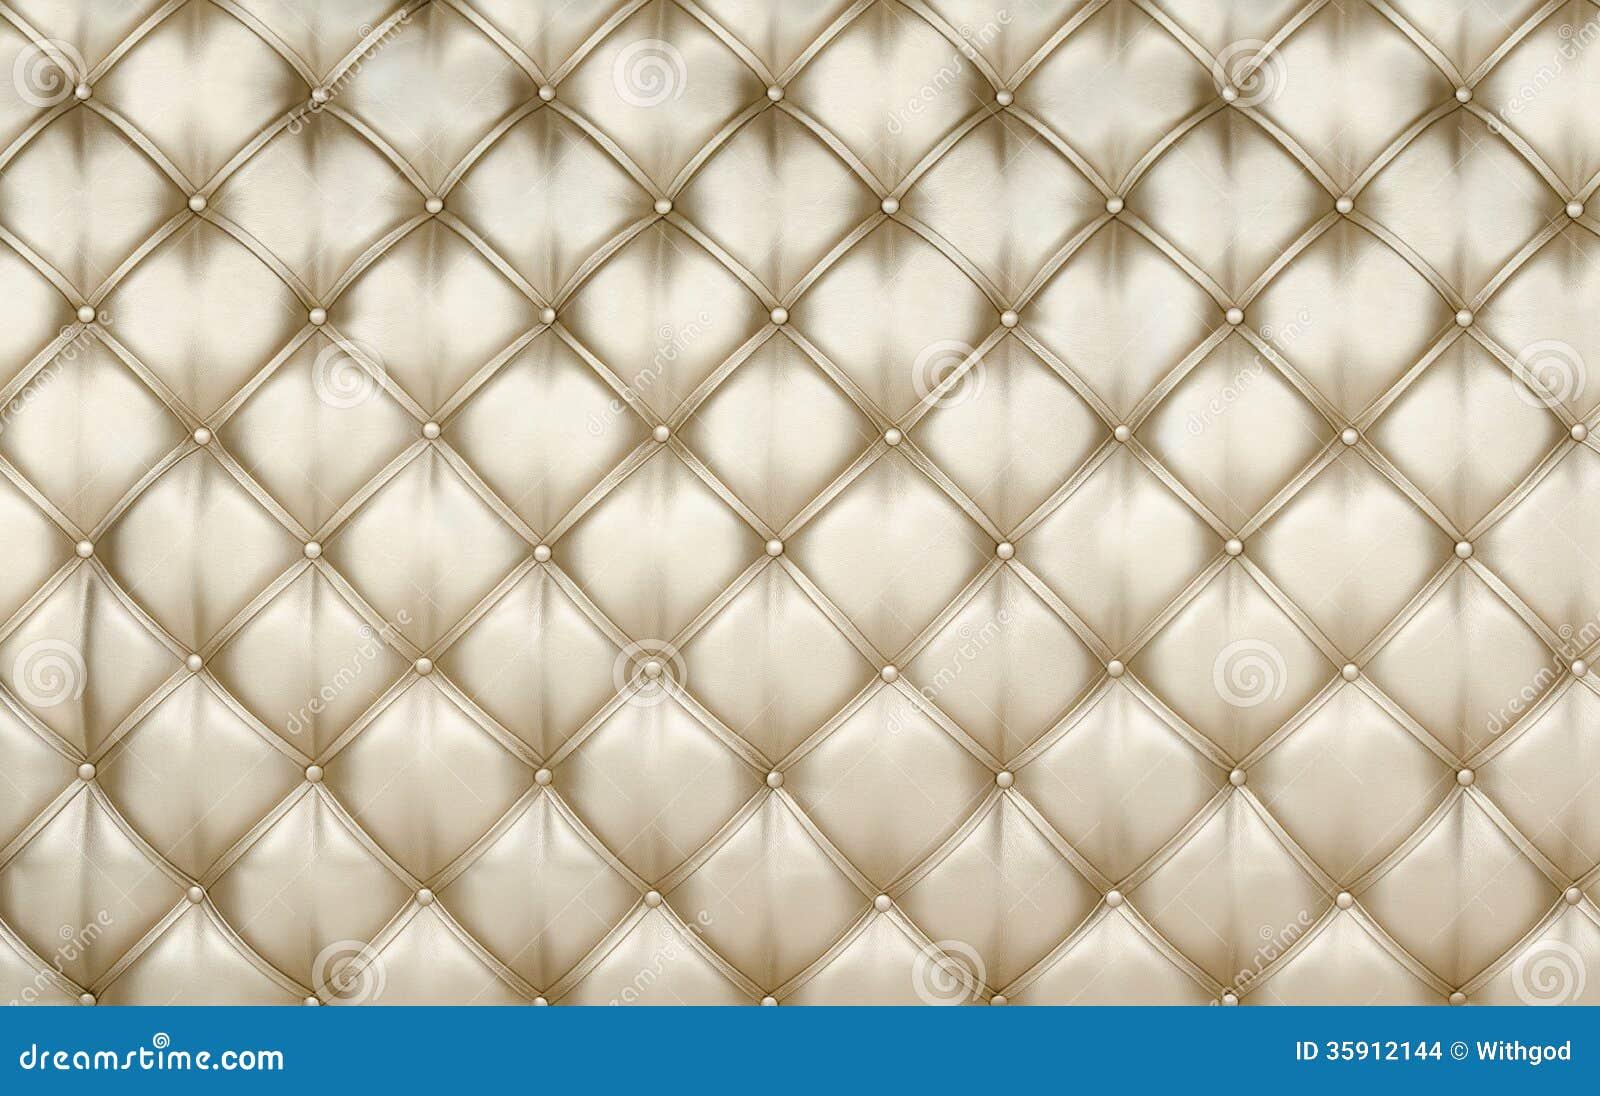 Golden Upholstery Background Stock Photo - Image: 35912144